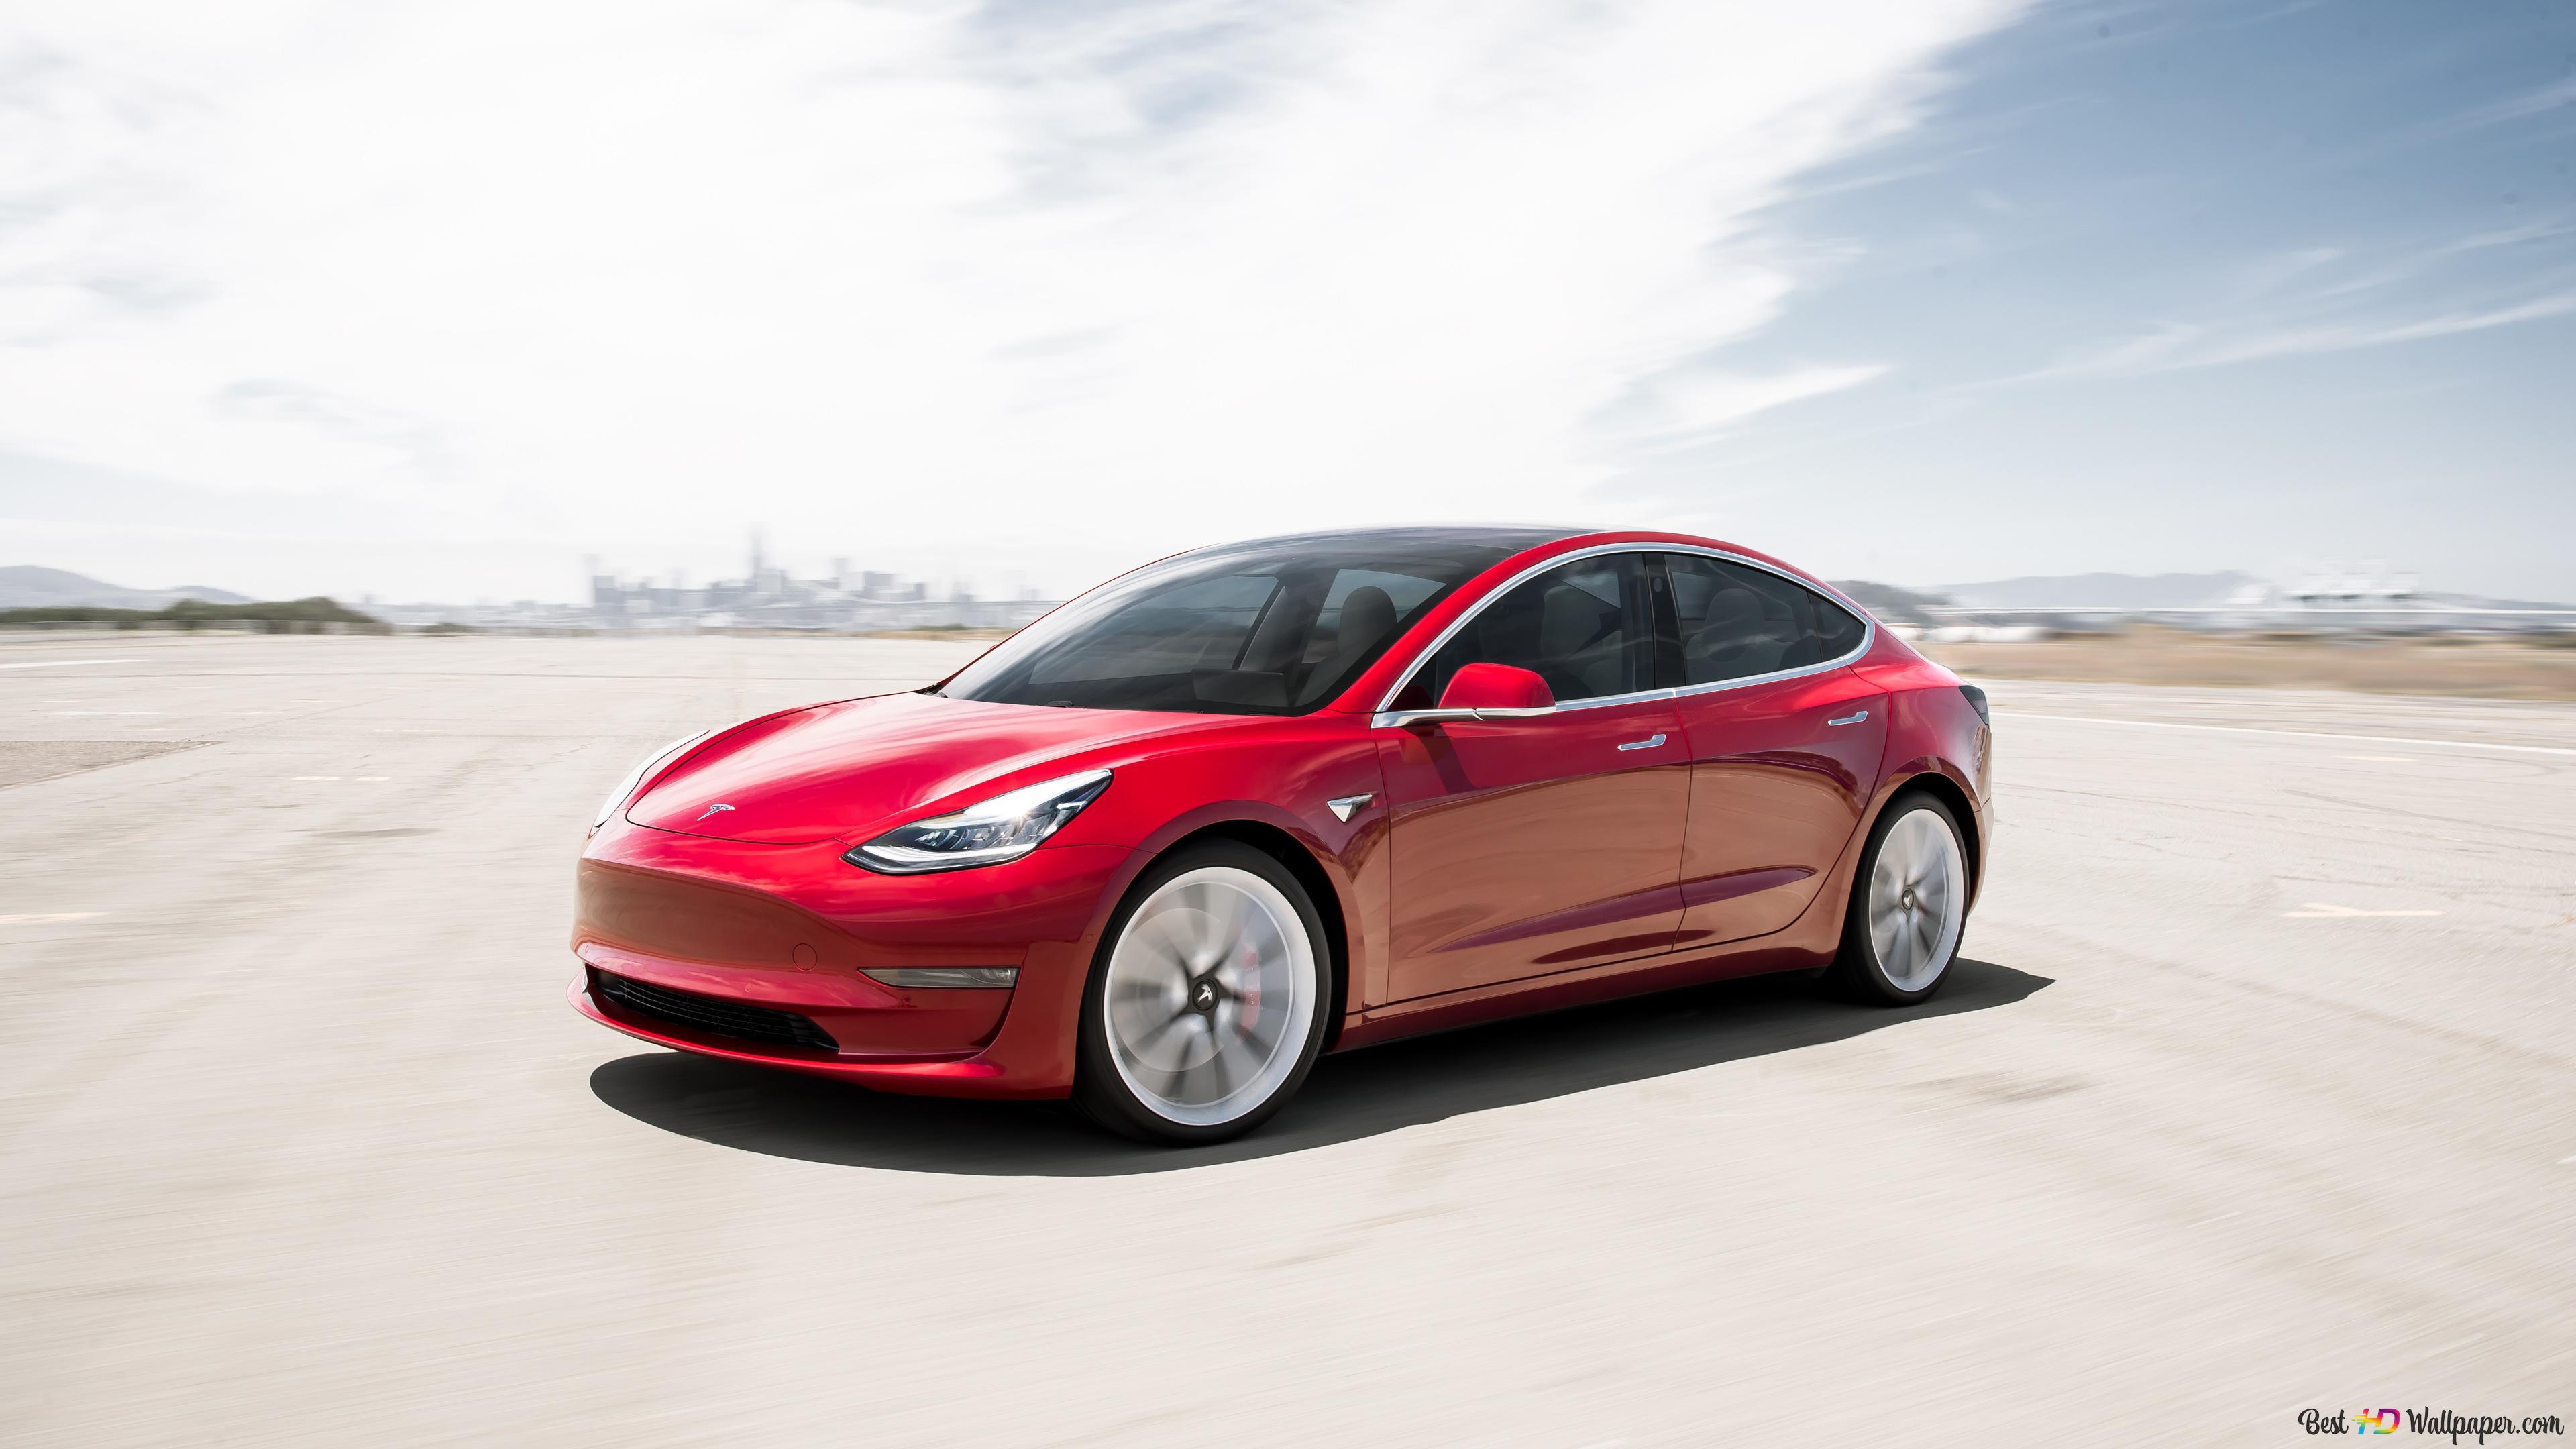 Red Car Tesla Model 3 Hd Wallpaper Download